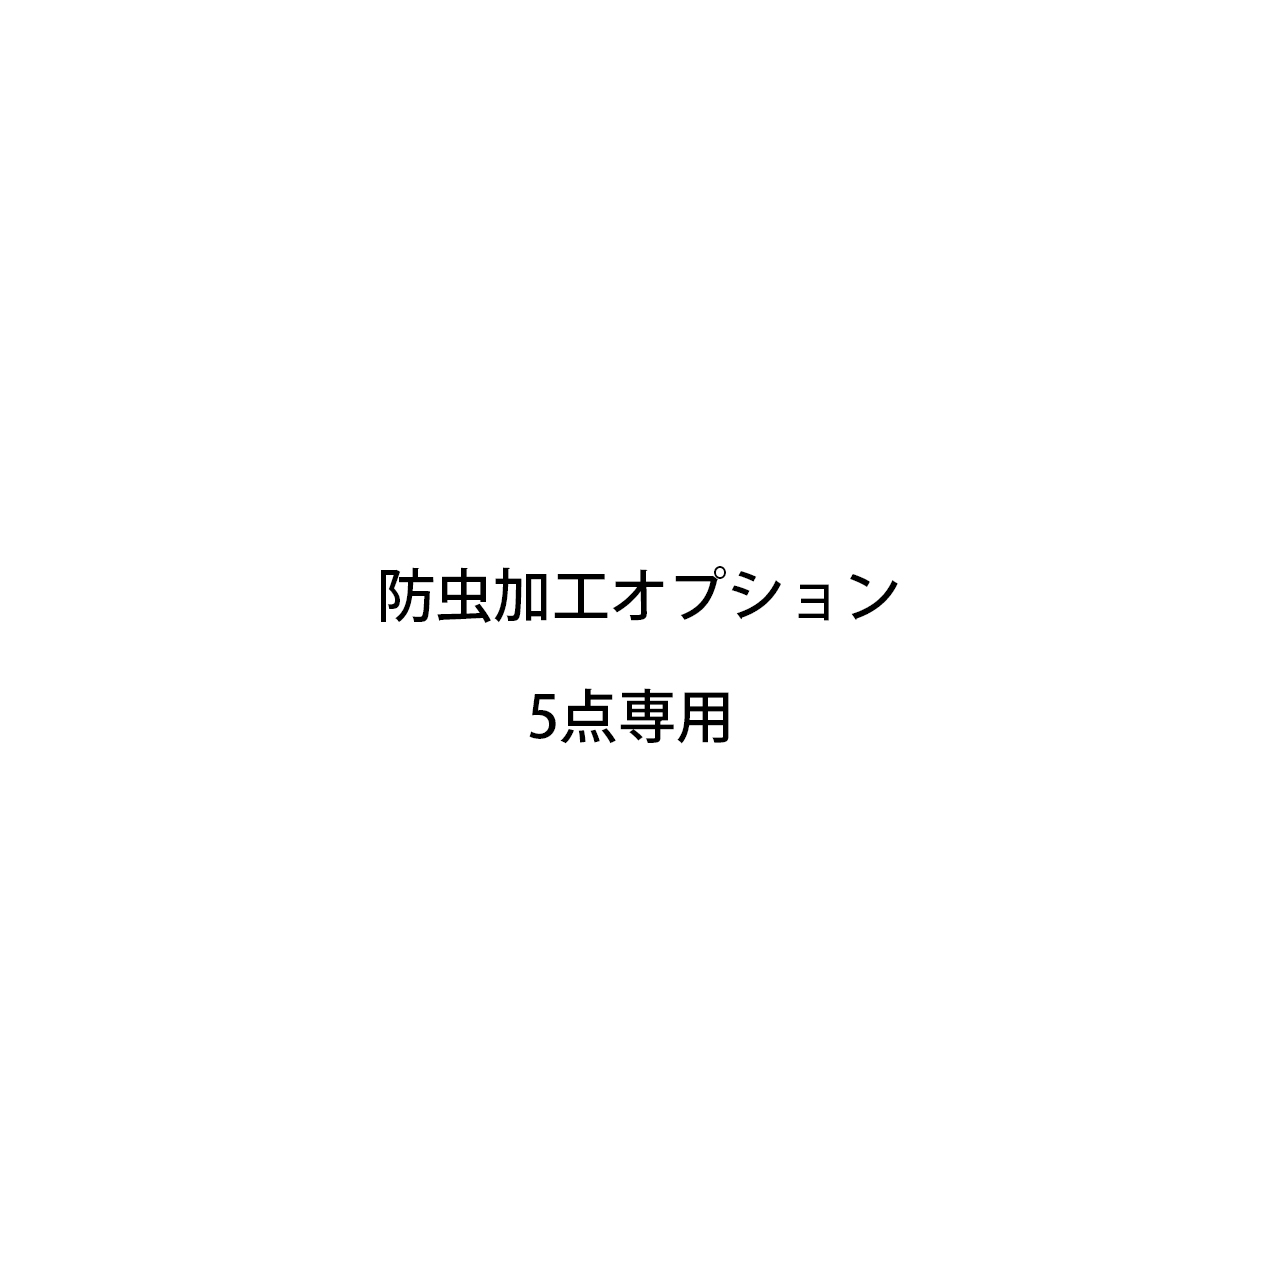 〔CARE MAINTENANCE_5 専用オプション〕防虫加工5点